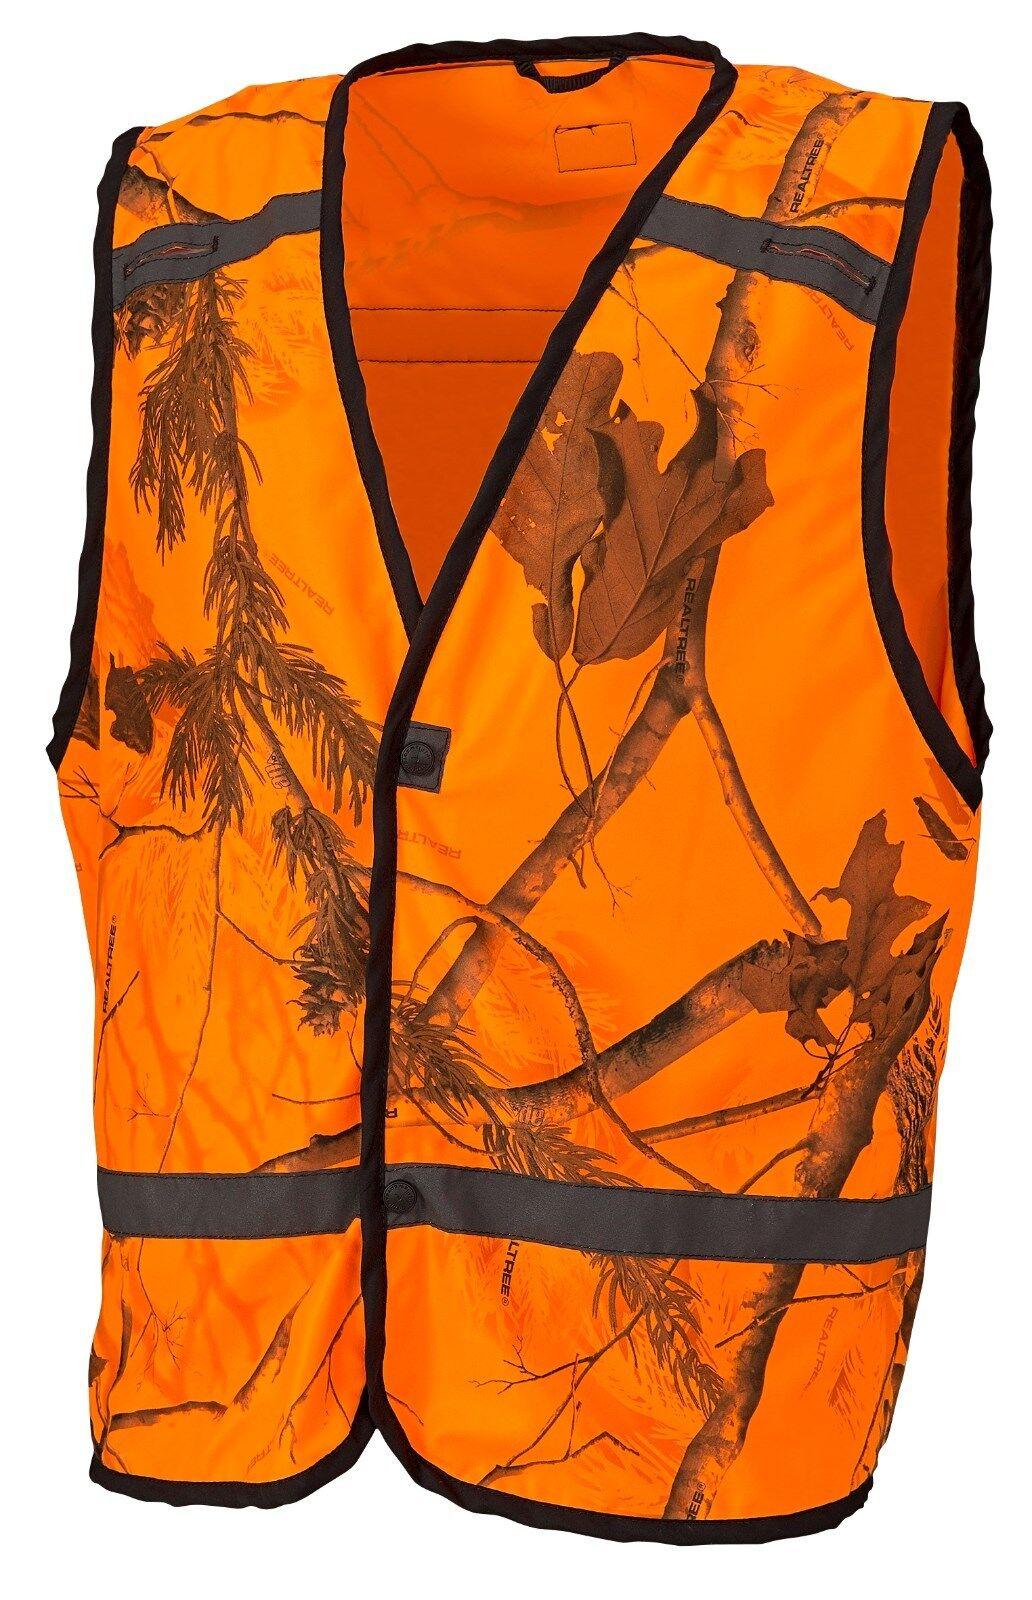 SwedTeam Hunting Vest Blaze - Realtree APB - 60-088